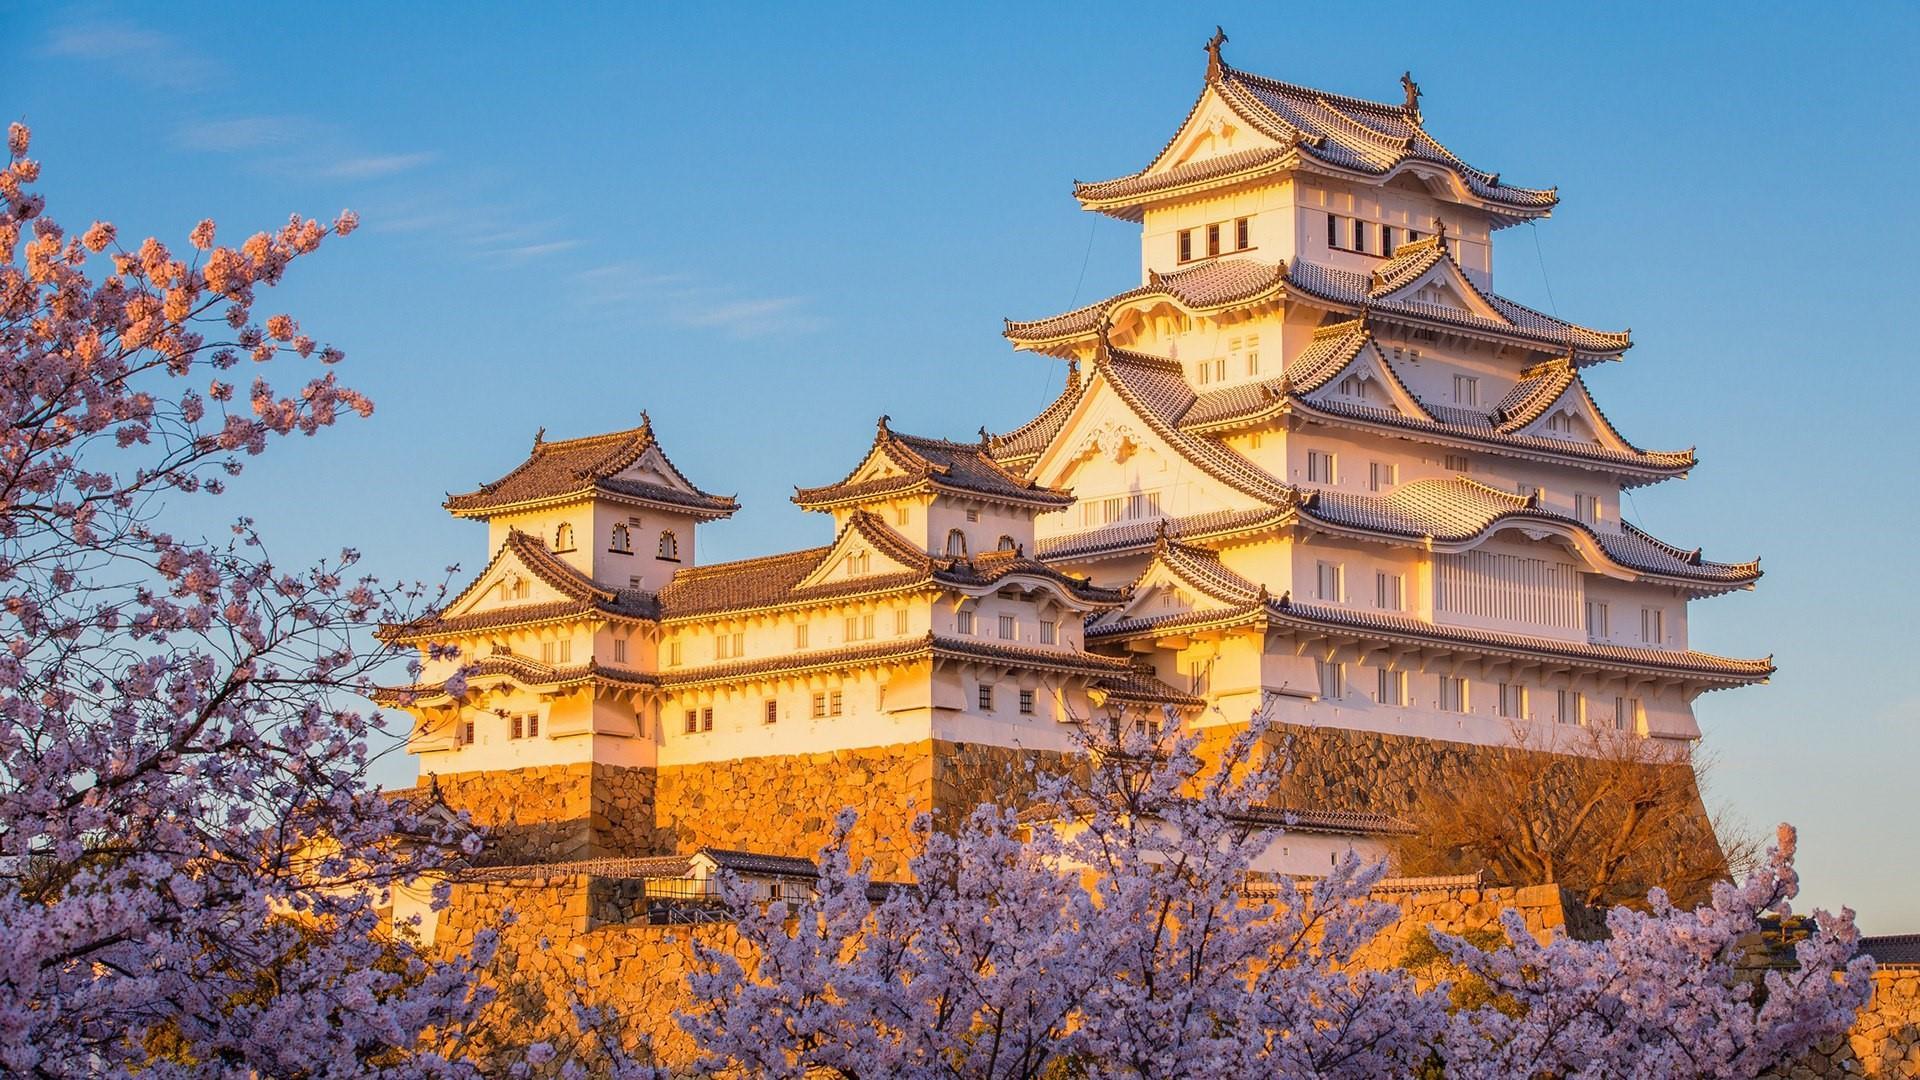 Japan Wallpapers • TrumpWallpapers